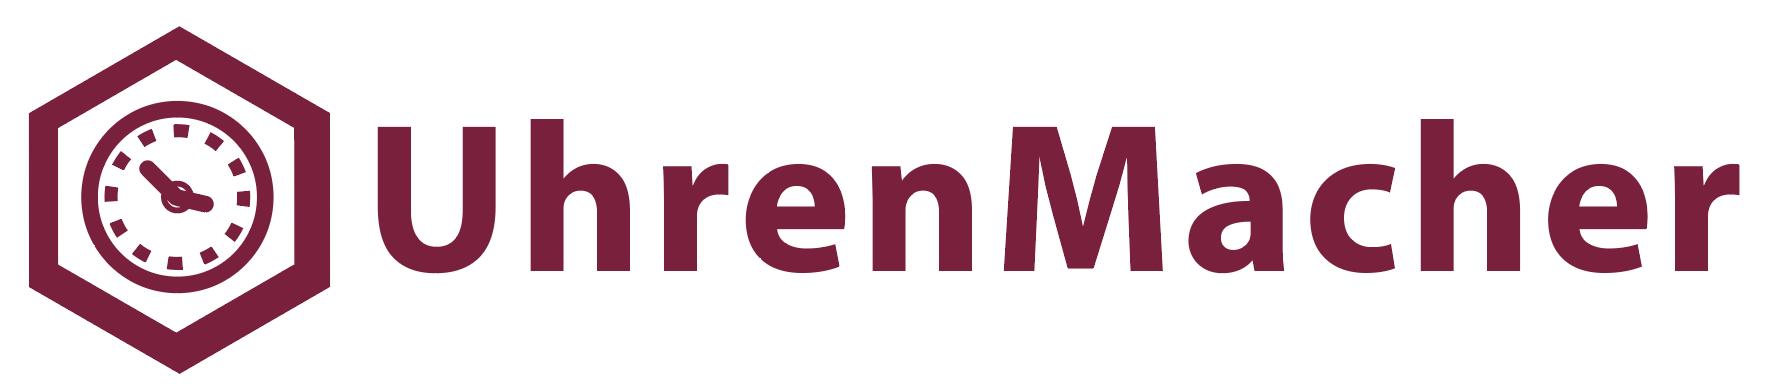 UhrenMacher_Logo